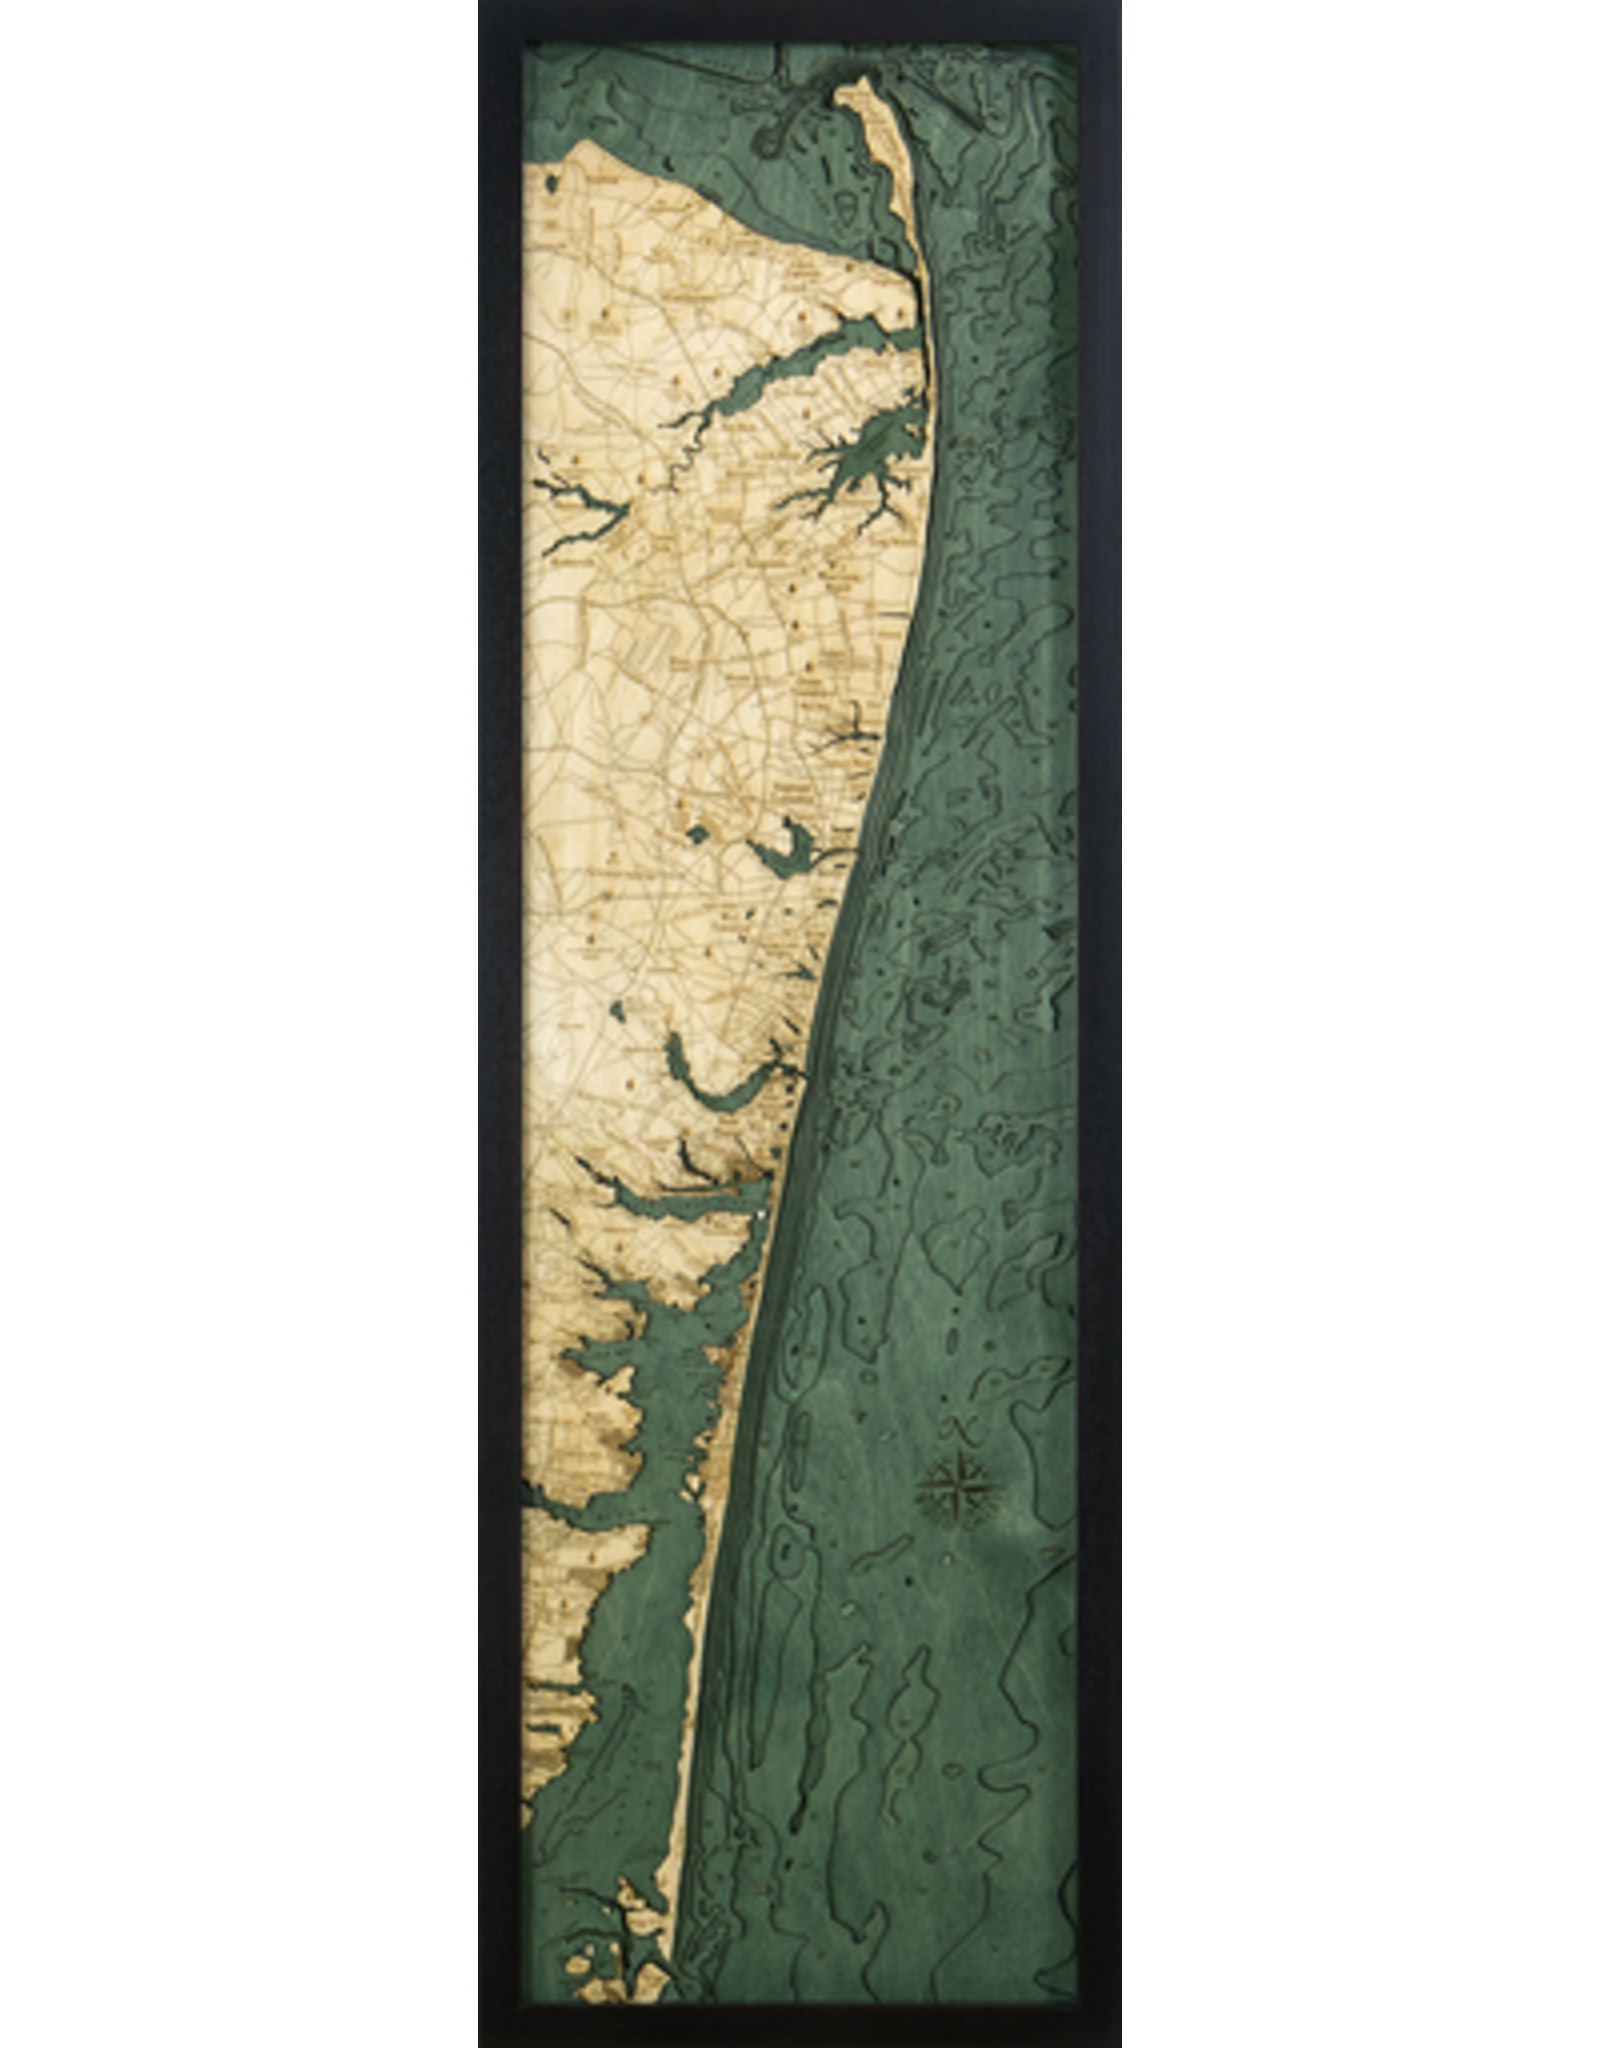 WoodCharts North Shore, NJ (Bathymetric 3-D Wood Carved Nautical Chart)